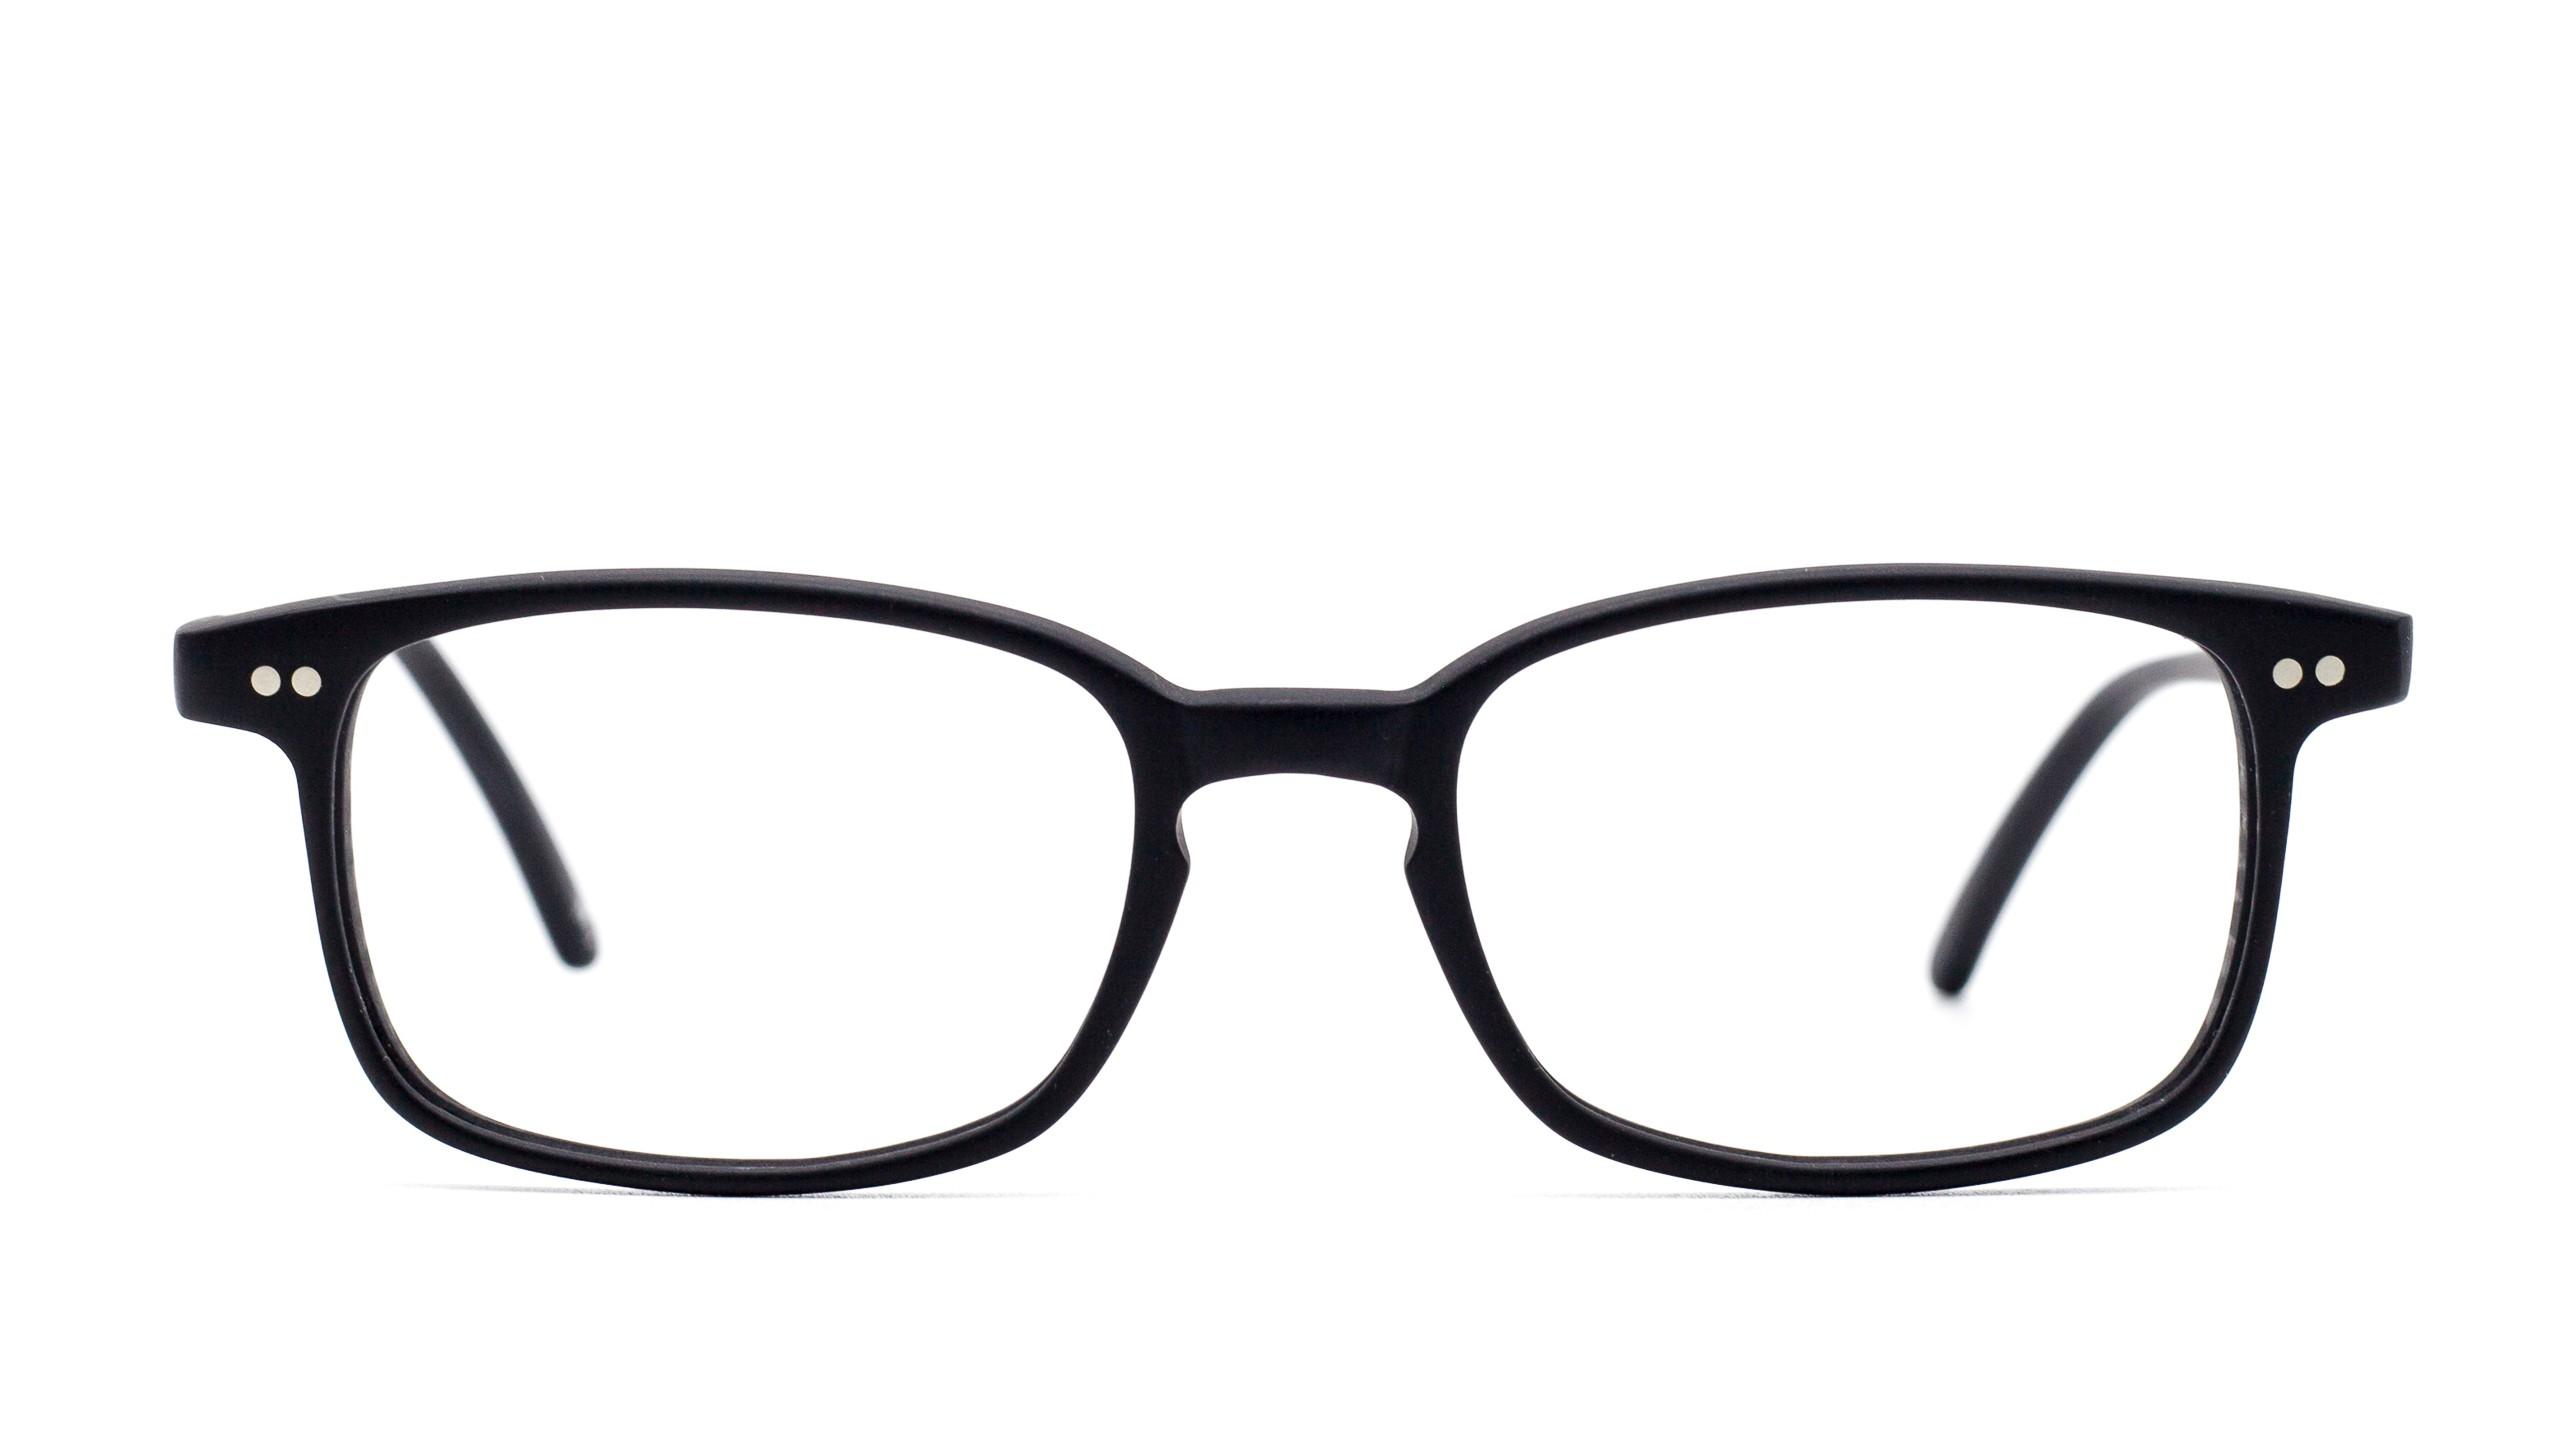 Eyeglasses-Nathan-Kaltermann-made-in-Italy-Eddy-C01M-Vista1